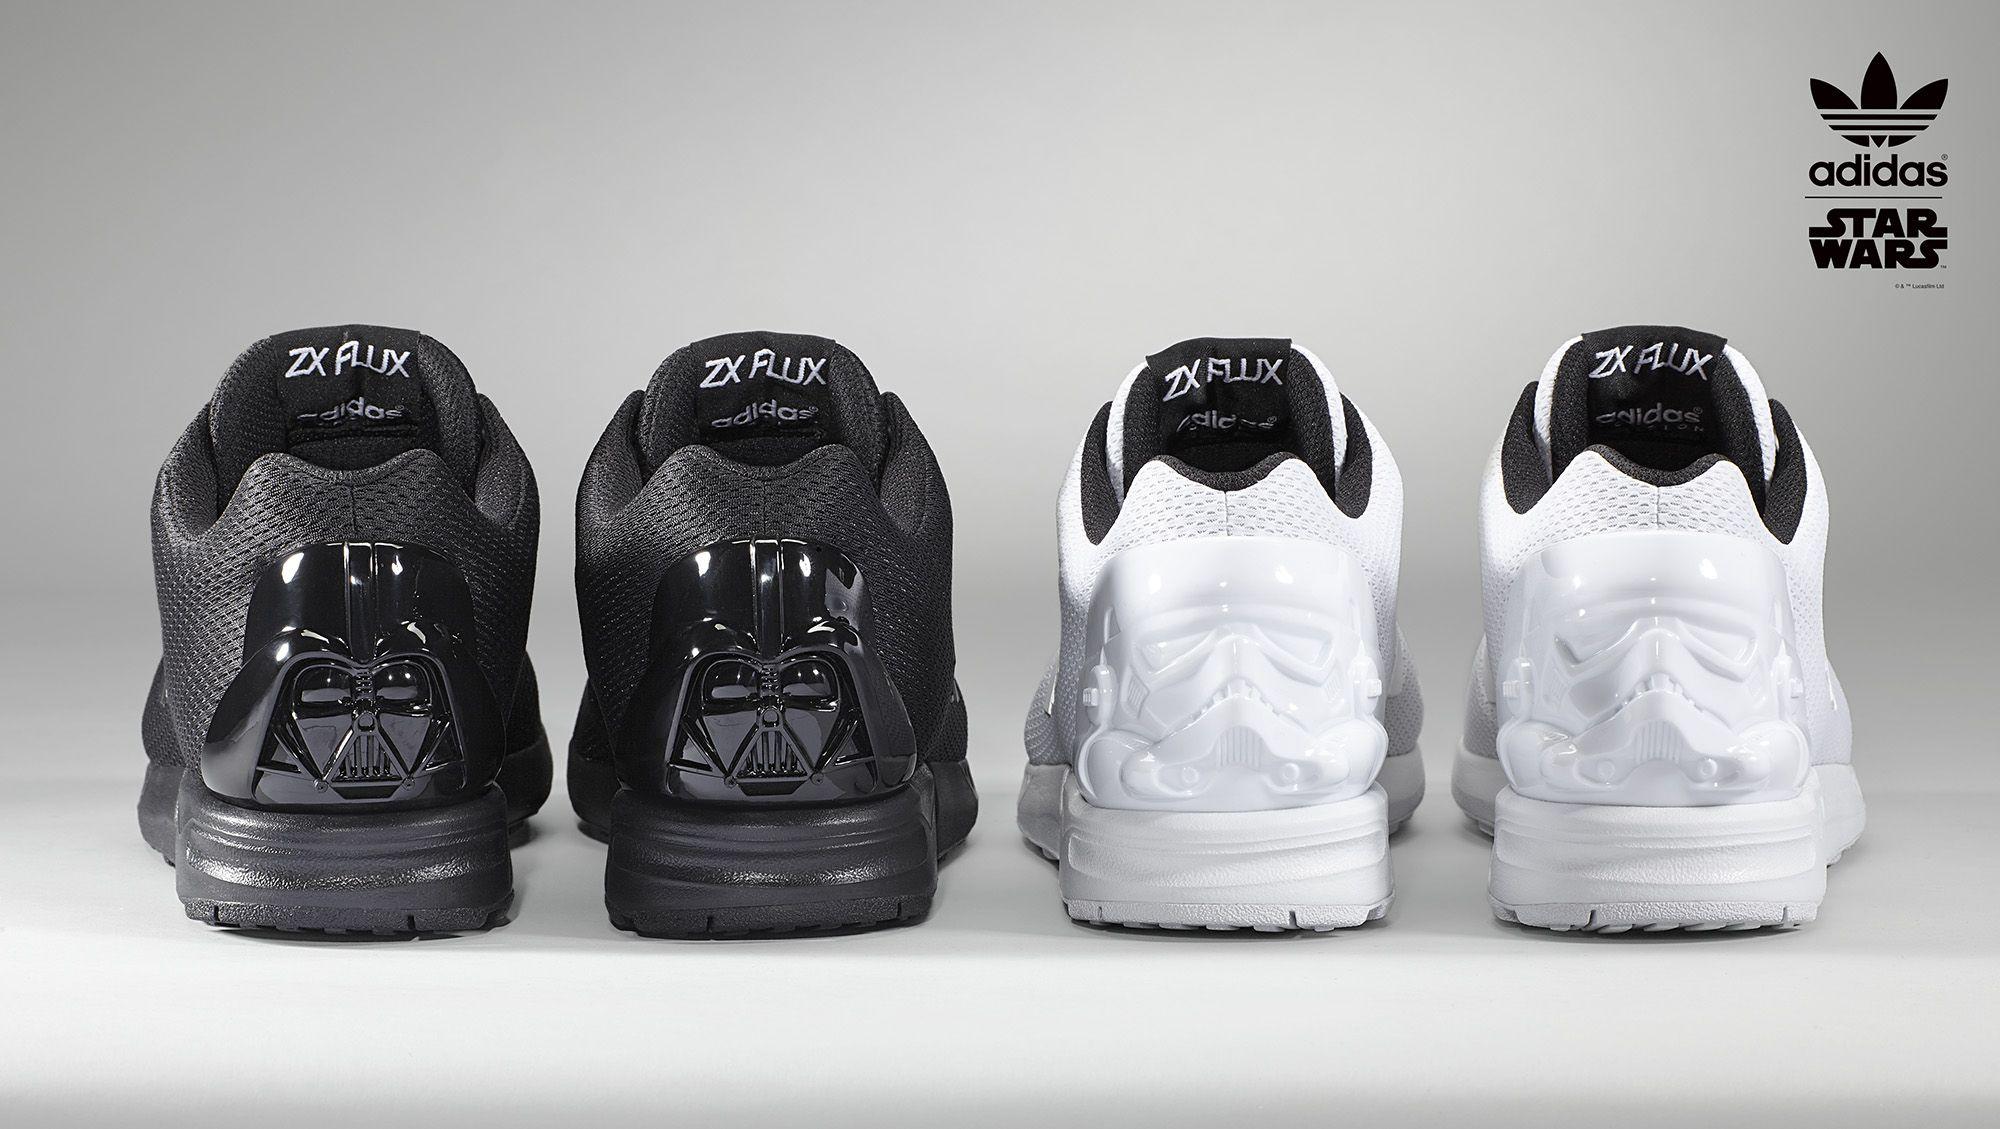 5ffecd25a mi adidas Offers New Star Wars Custom Options for the ZX Flux ...